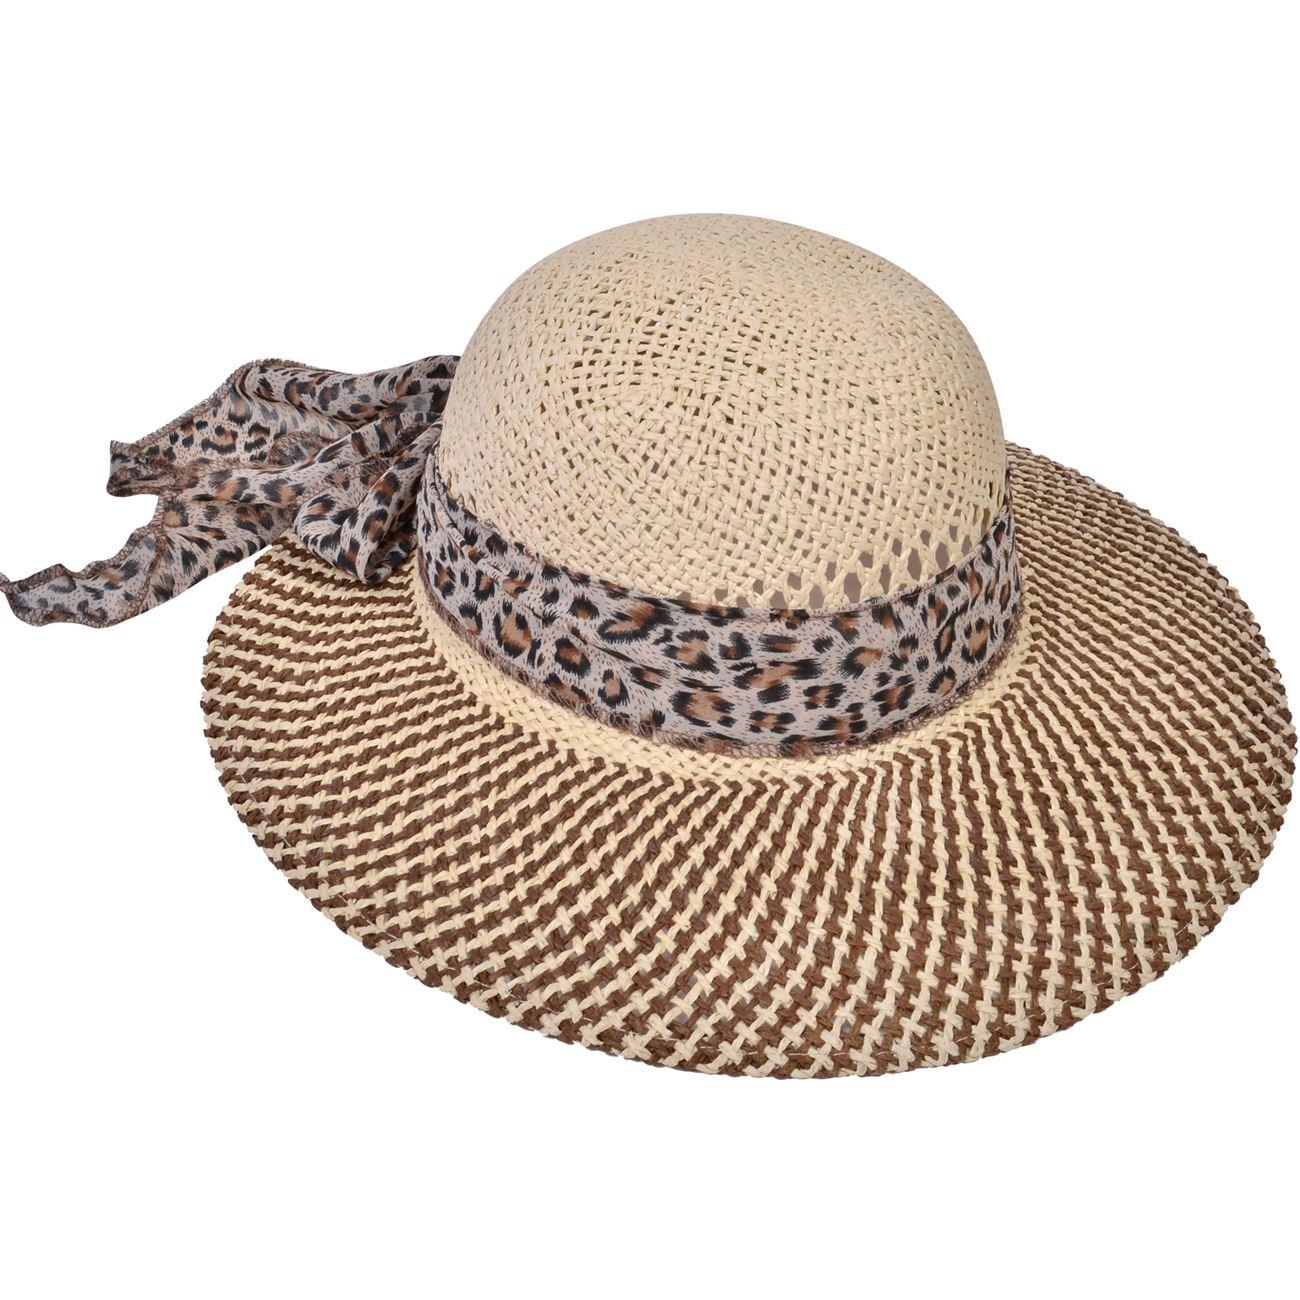 4d0debd5dc Καπέλο Γυναικείο Animal Print Κορδέλα   Καπέλα Ψάθινα Γυναικεία